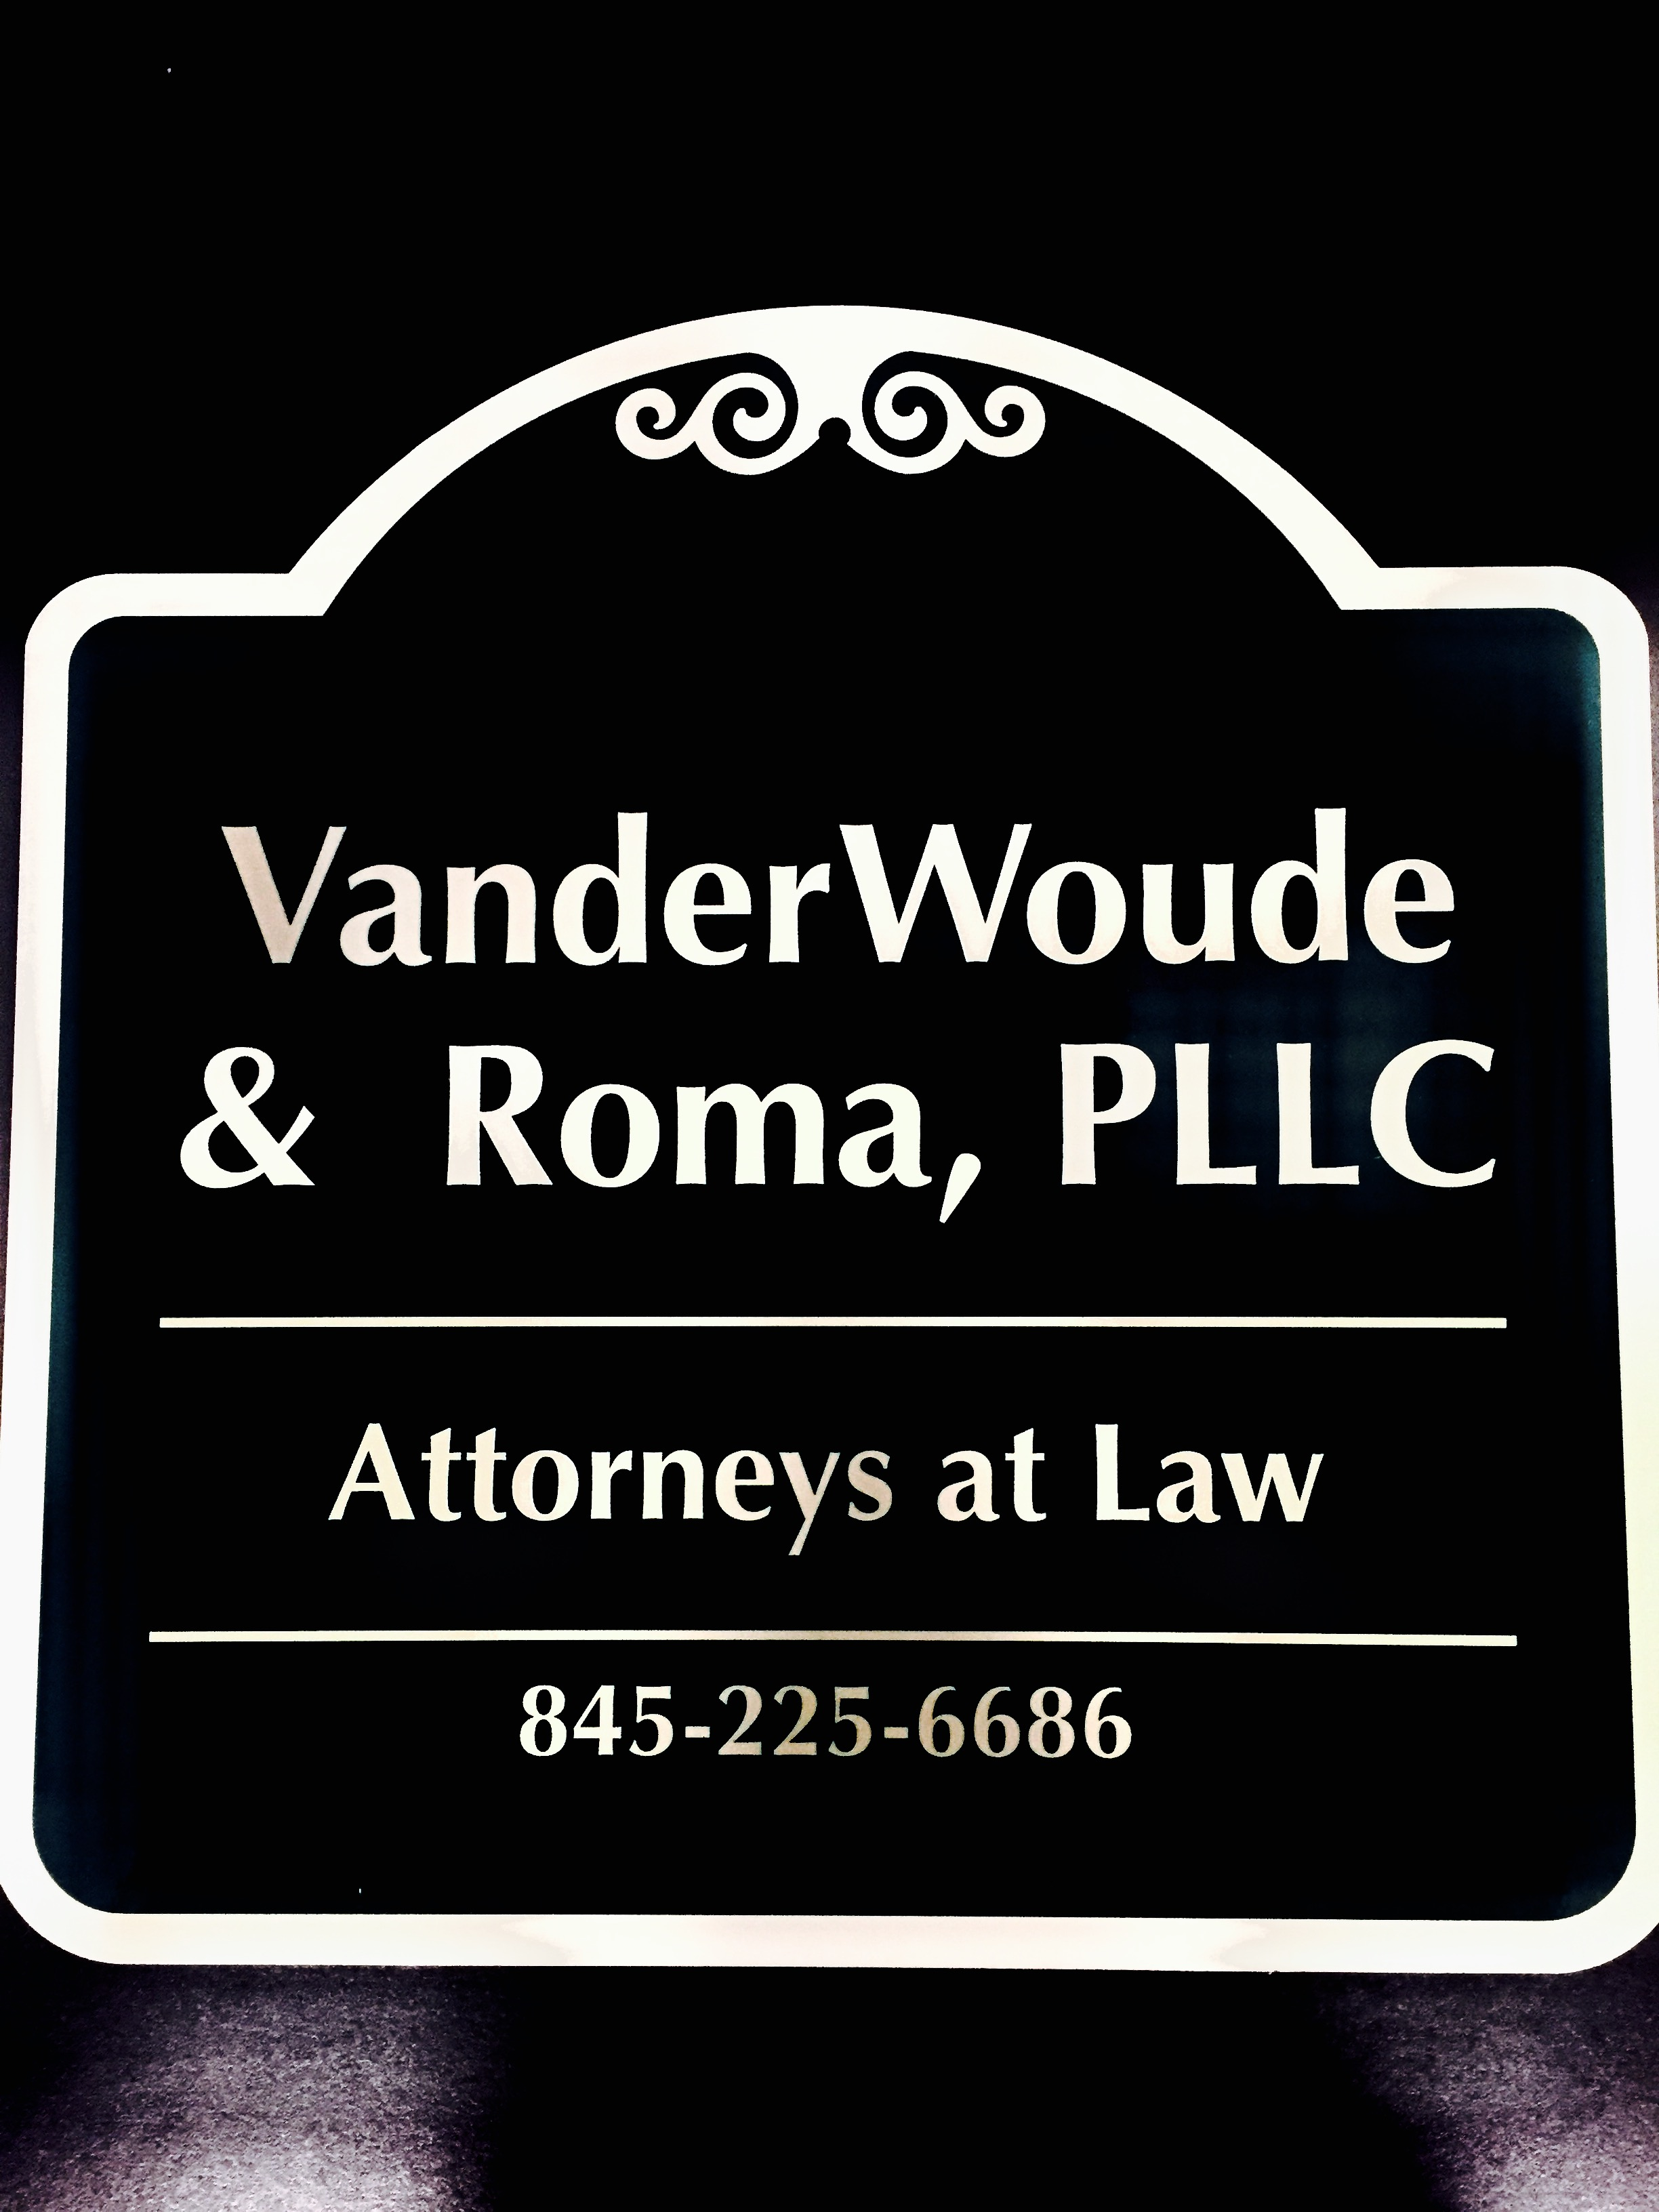 VanderWoude & Roma, PLLC